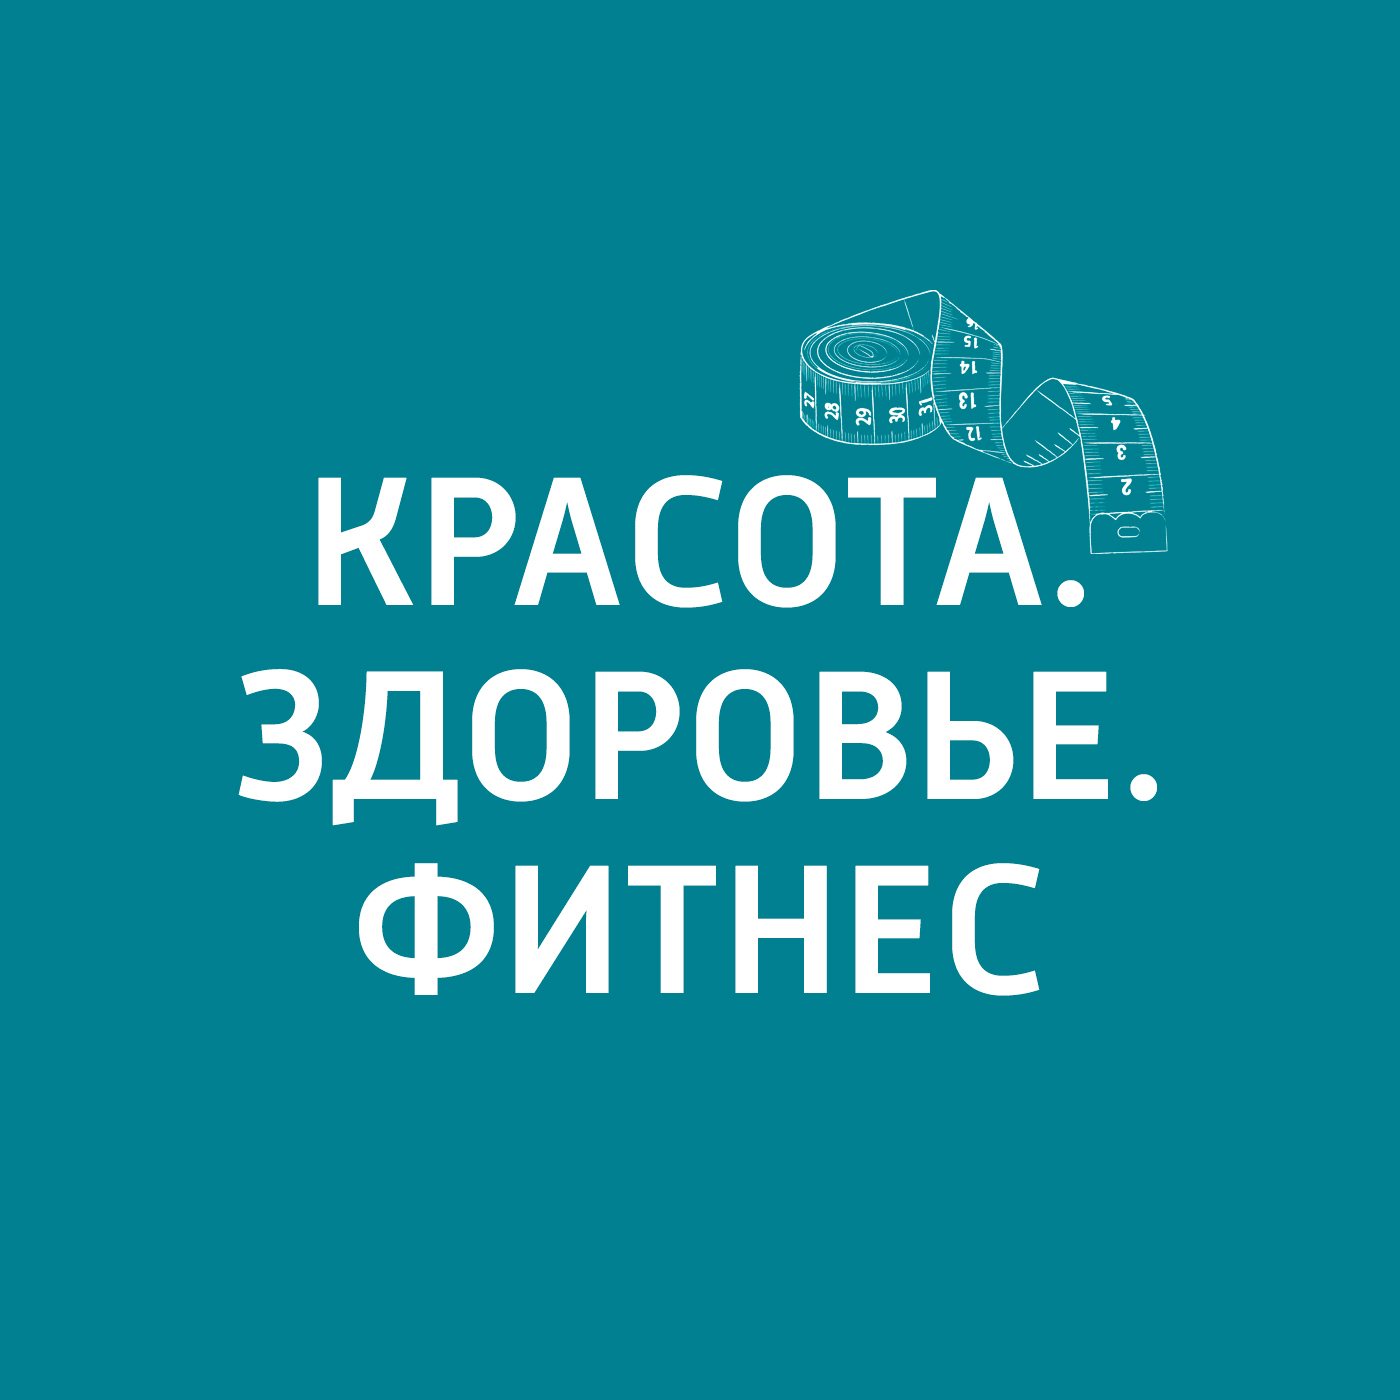 Маргарита Митрофанова Оружие против старения: терапия или хирургия?